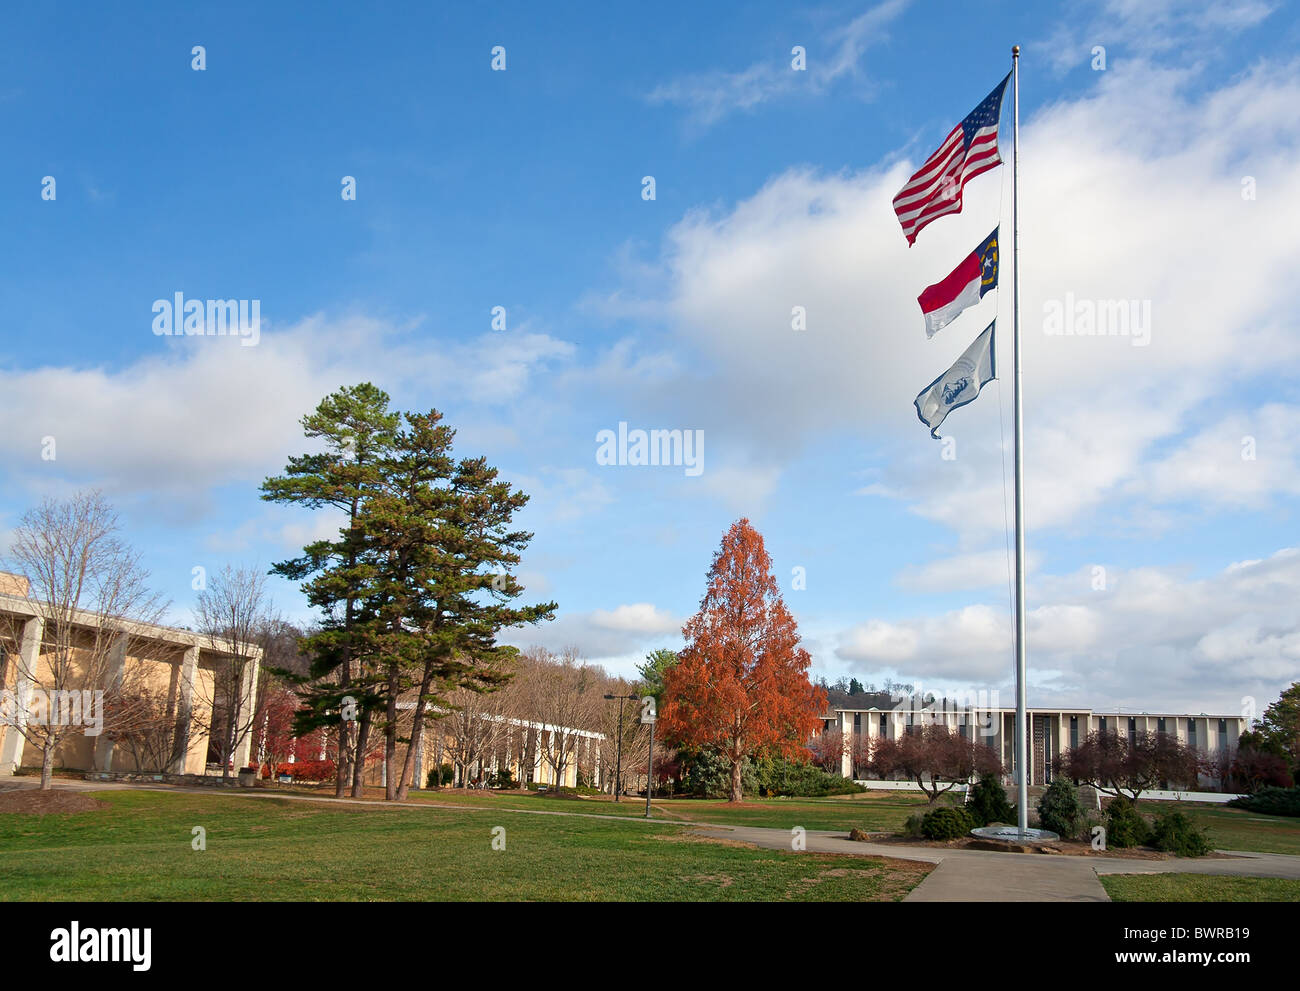 University of North Carolina in Asheville Campus. Stockfoto